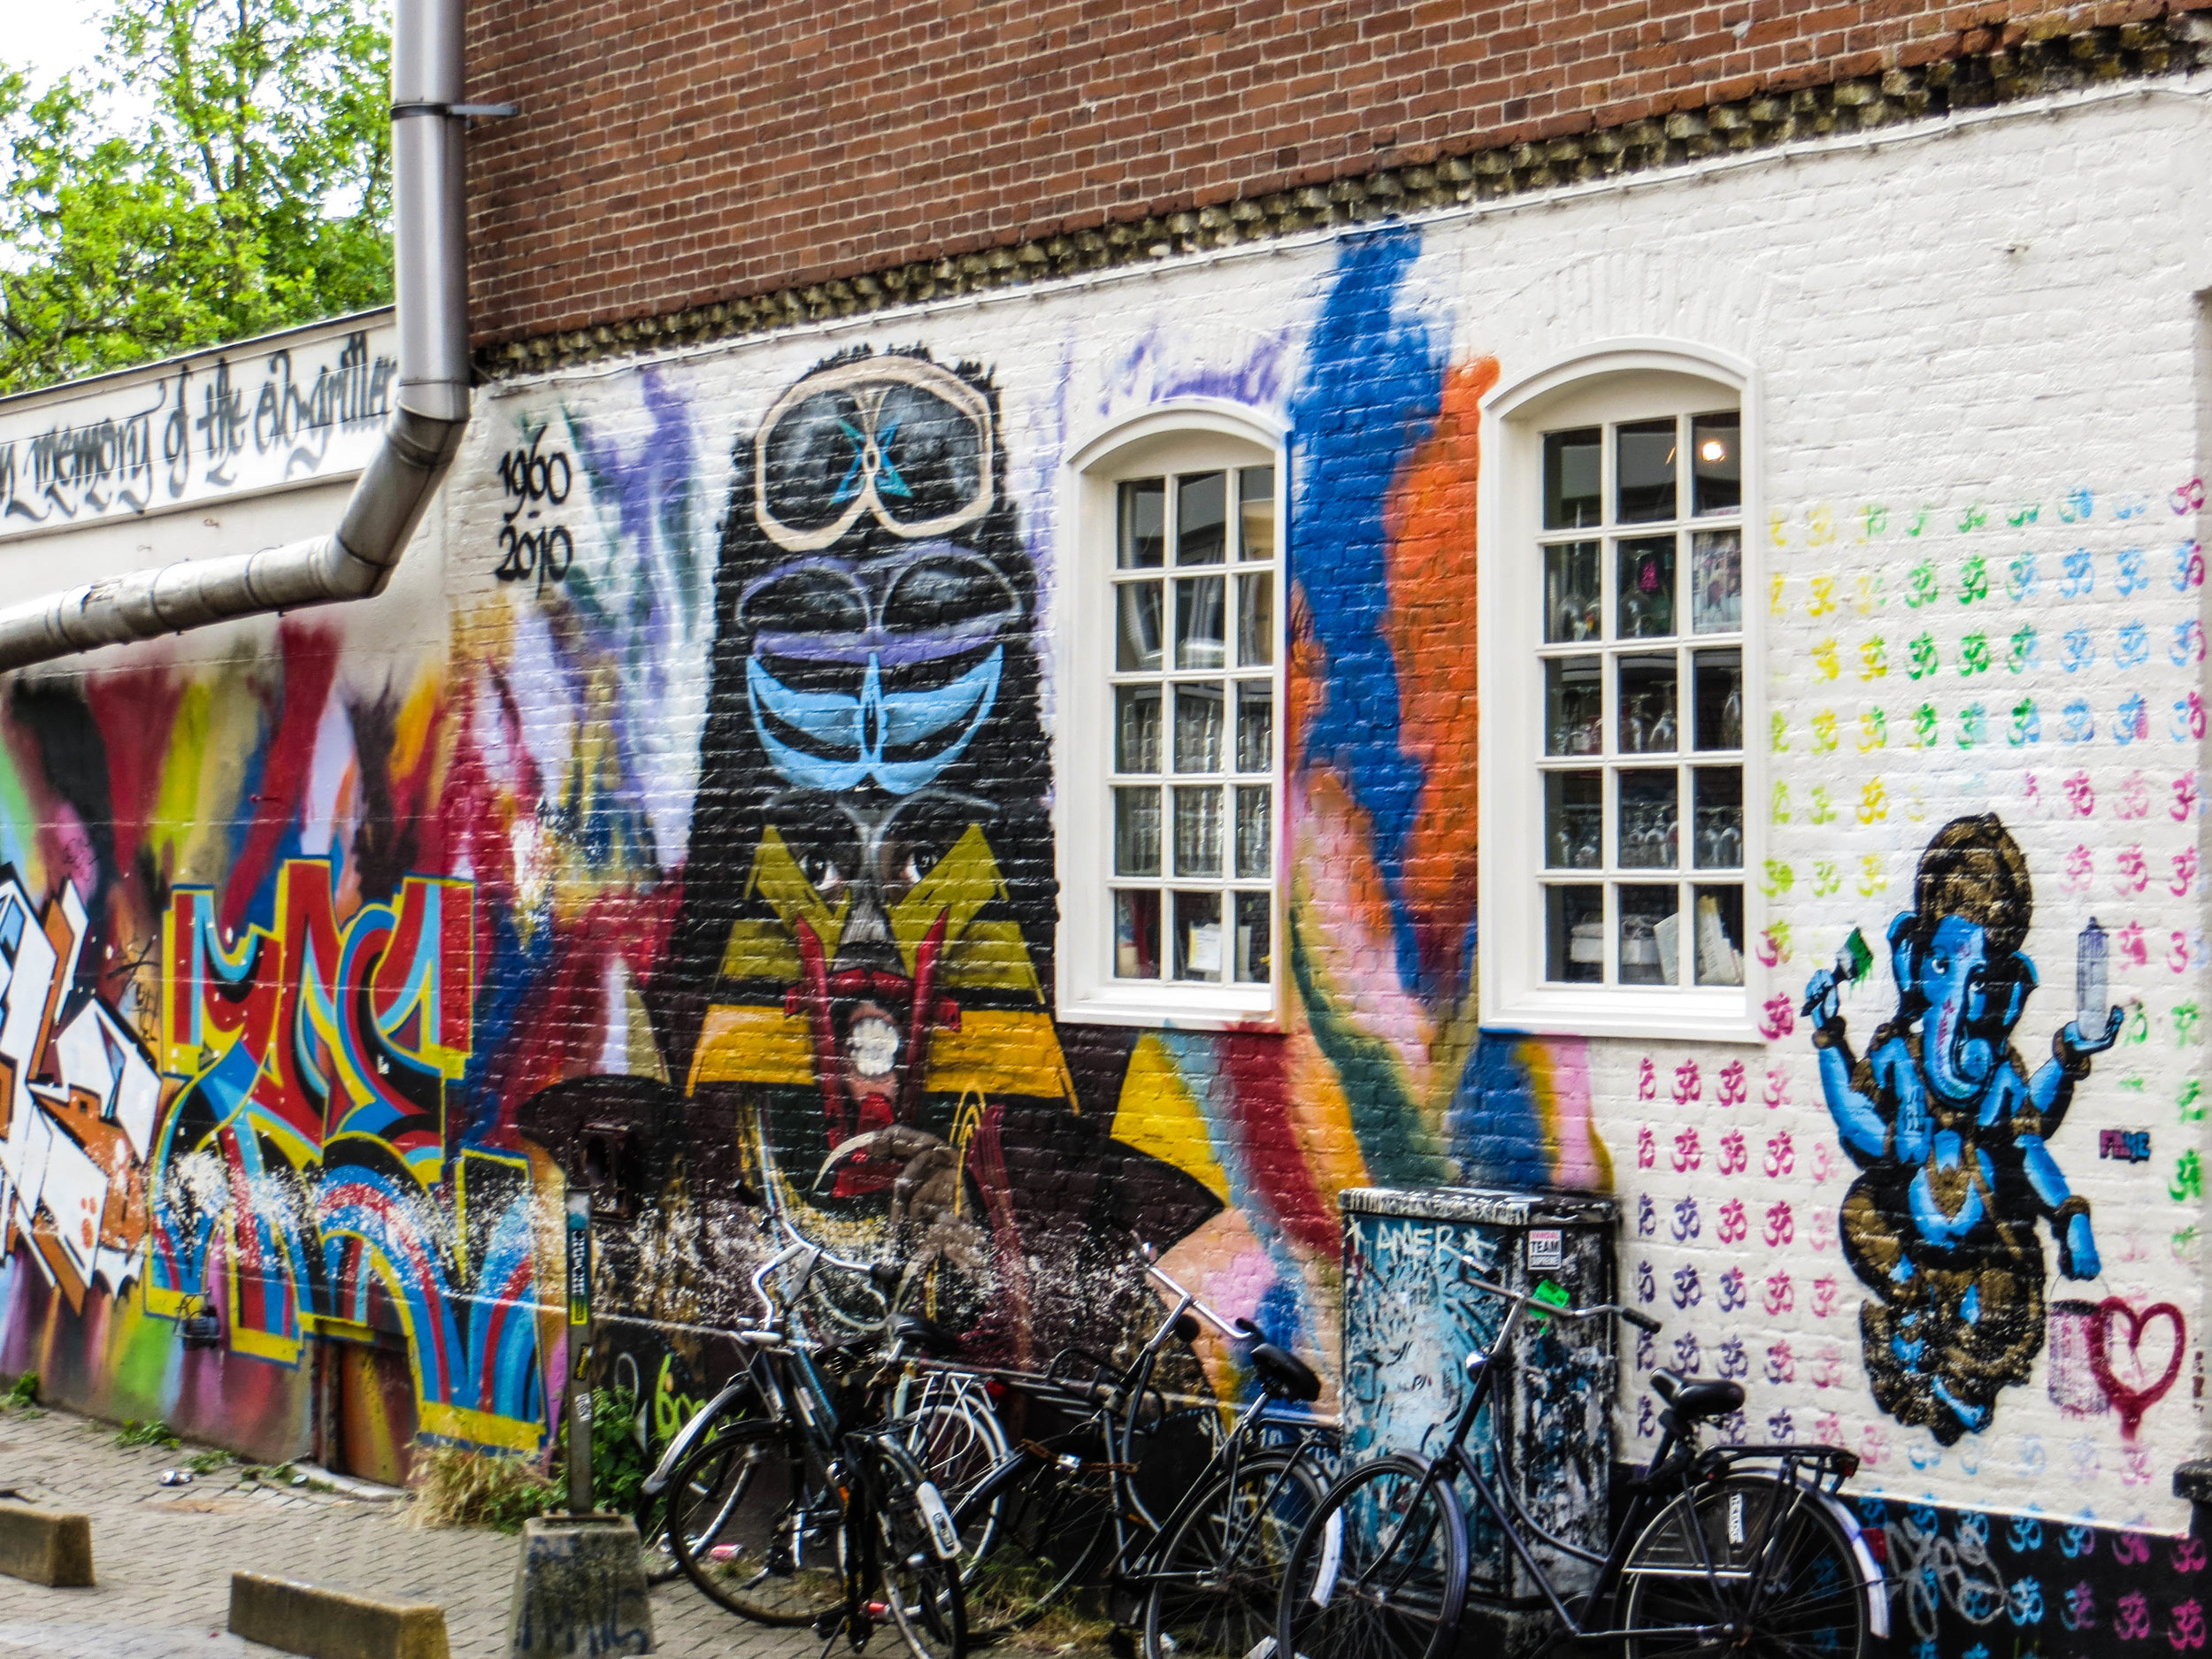 amsterdam-netherlands-street-photography-3-2.jpg